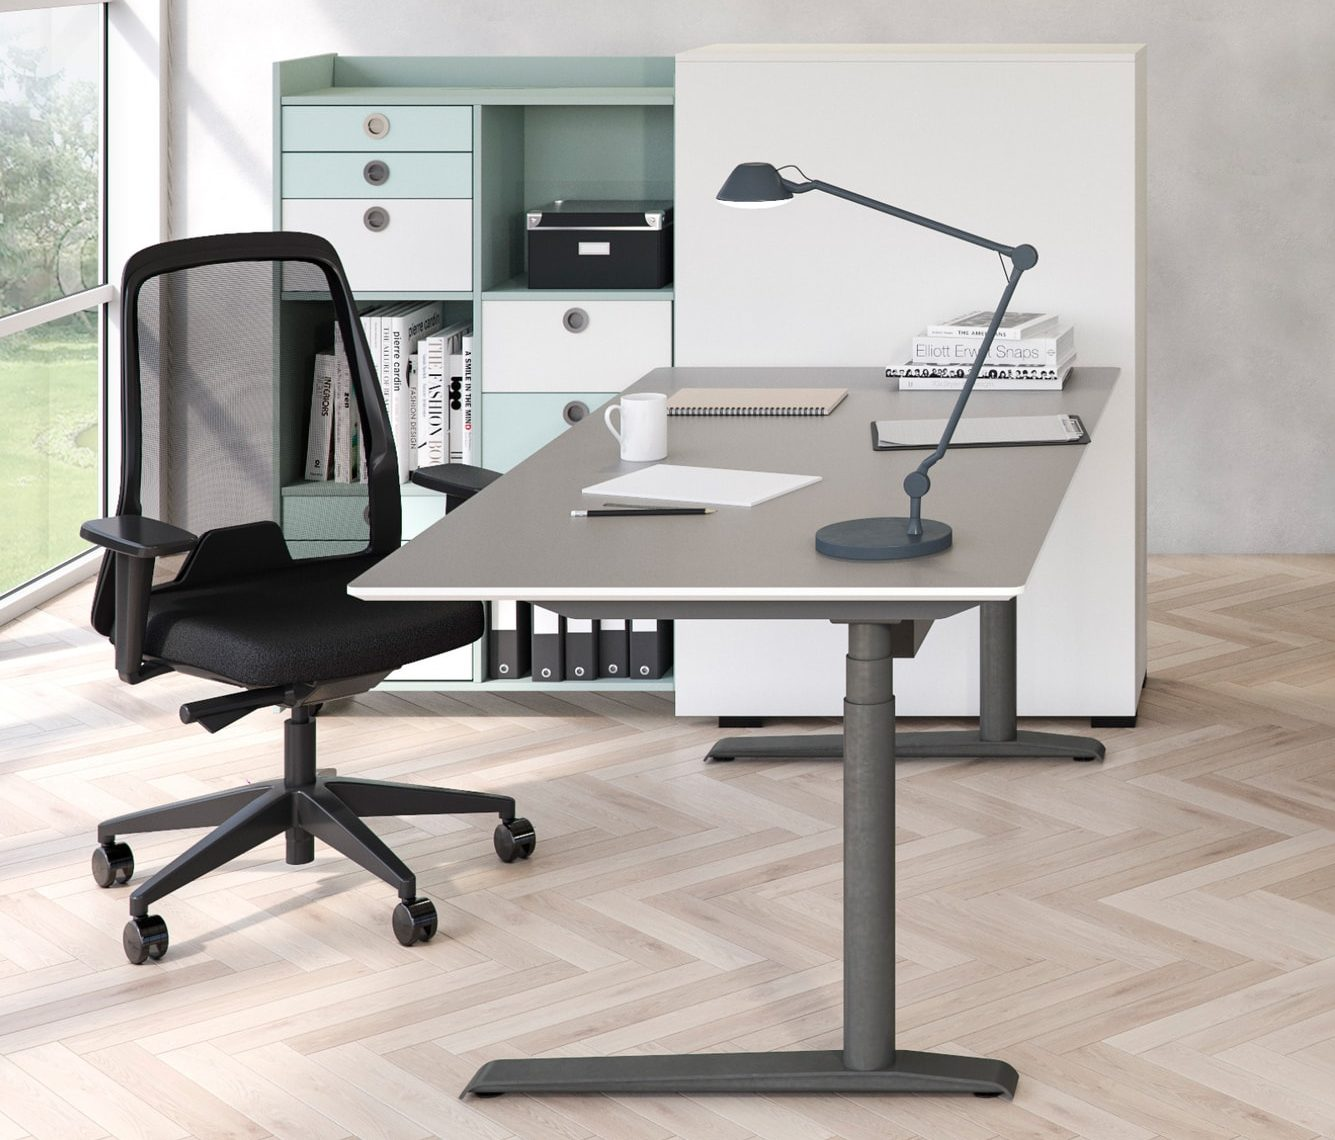 Cube Design - kontormøbler - Quadro skrivebord - rektangulær bordplade